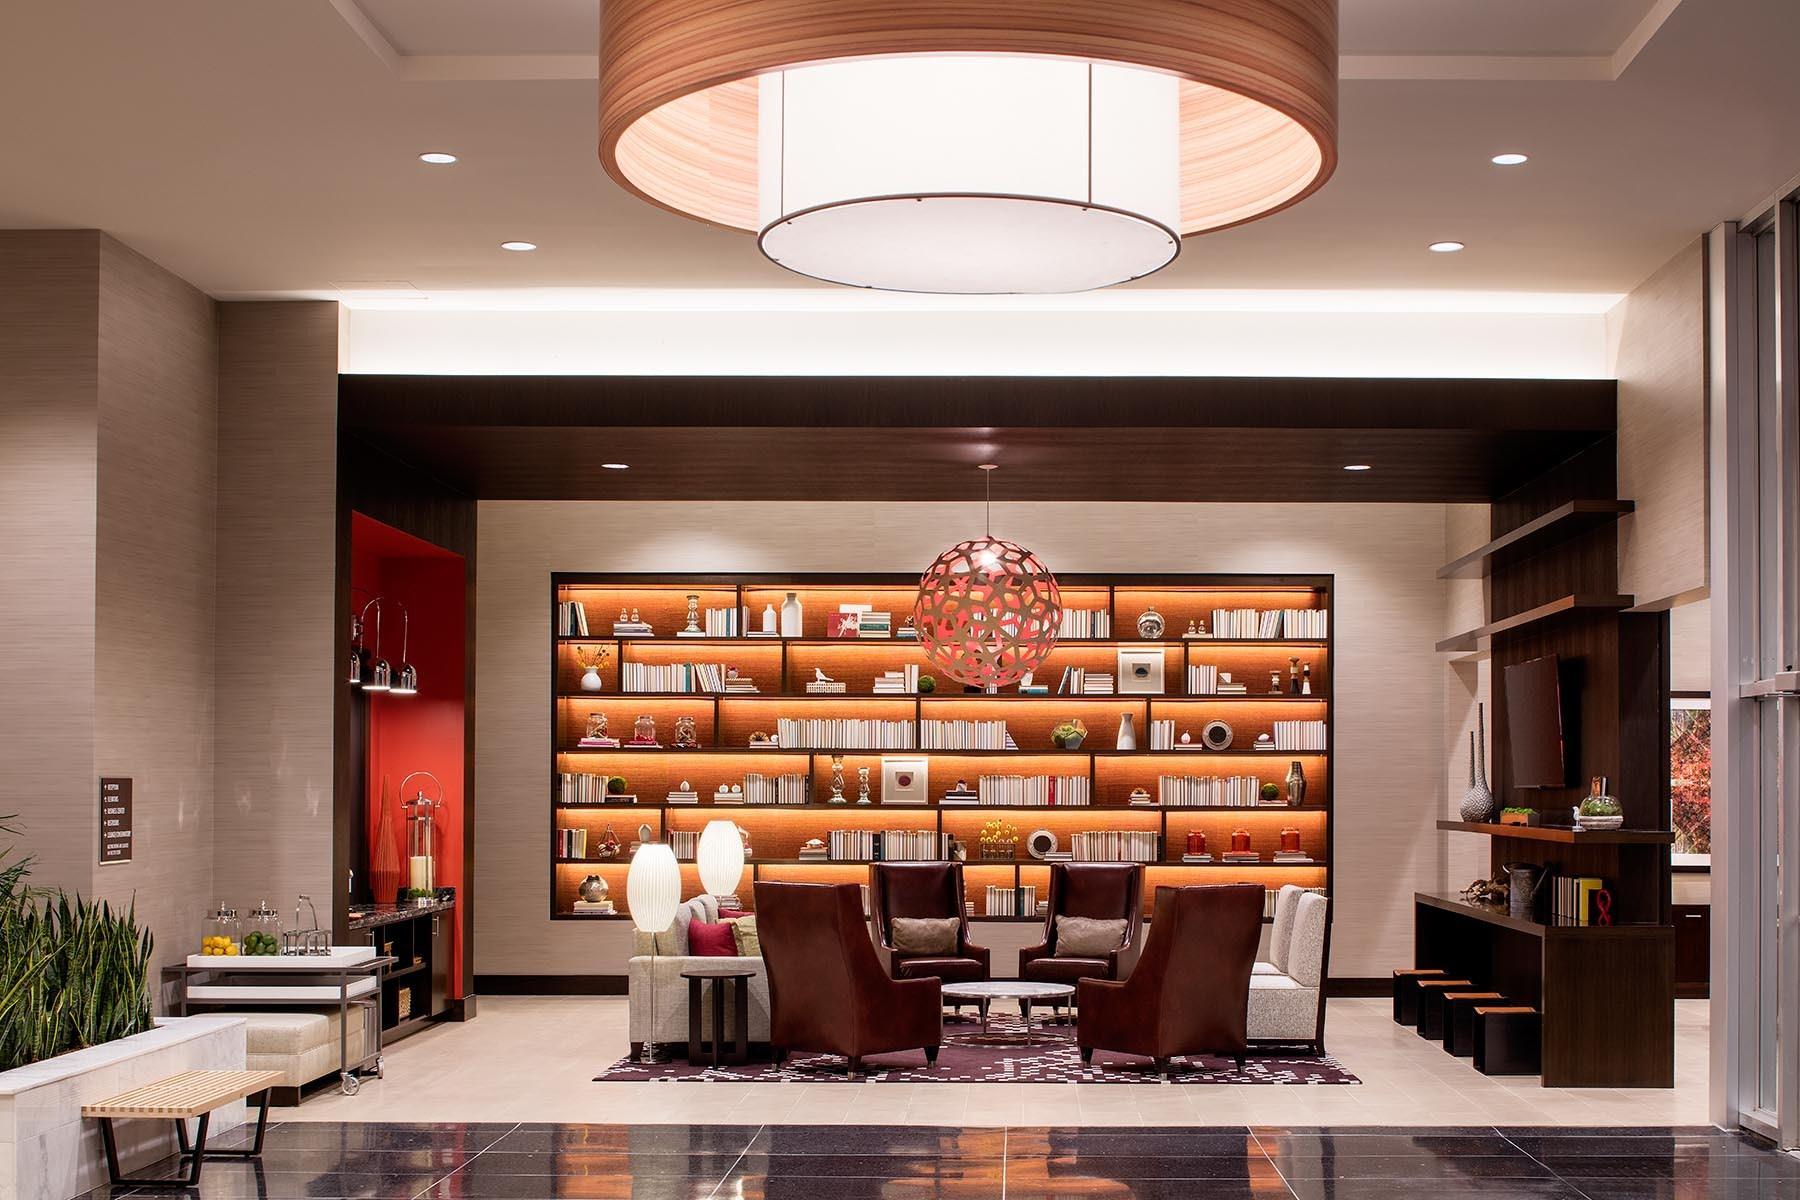 Meetings and Events at Hilton Garden Inn Downtown Dallas, Dallas, TX, US